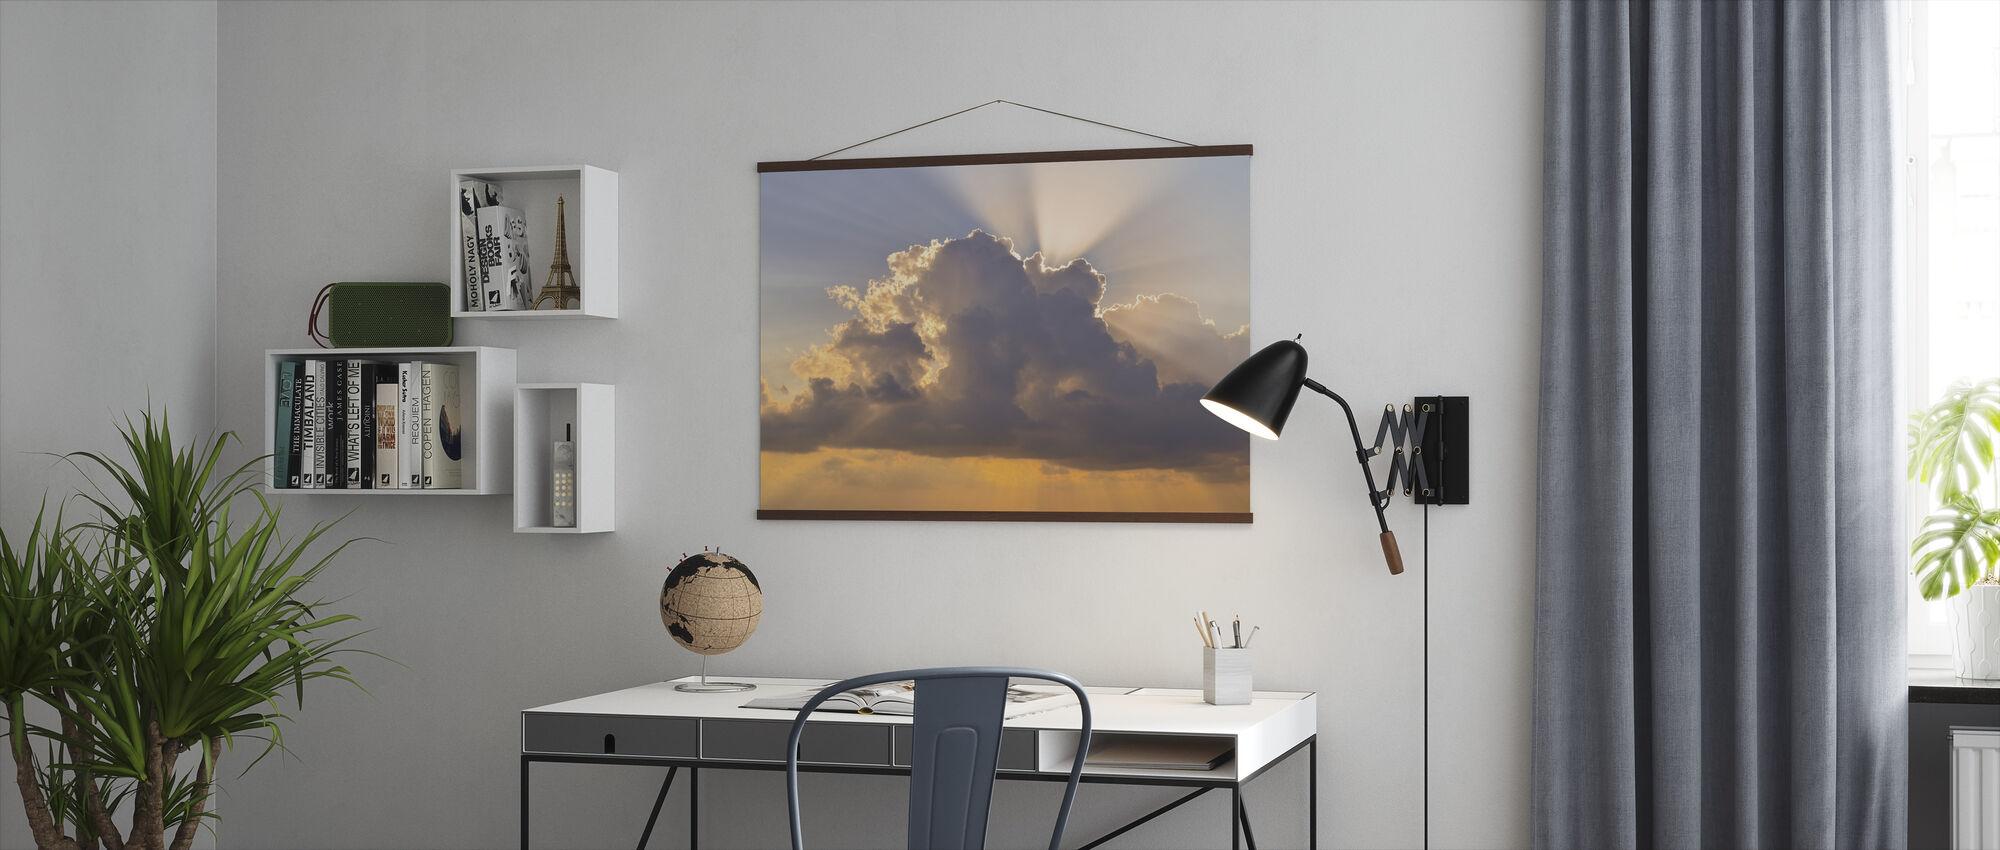 Cloudscape - Plakat - Kontor